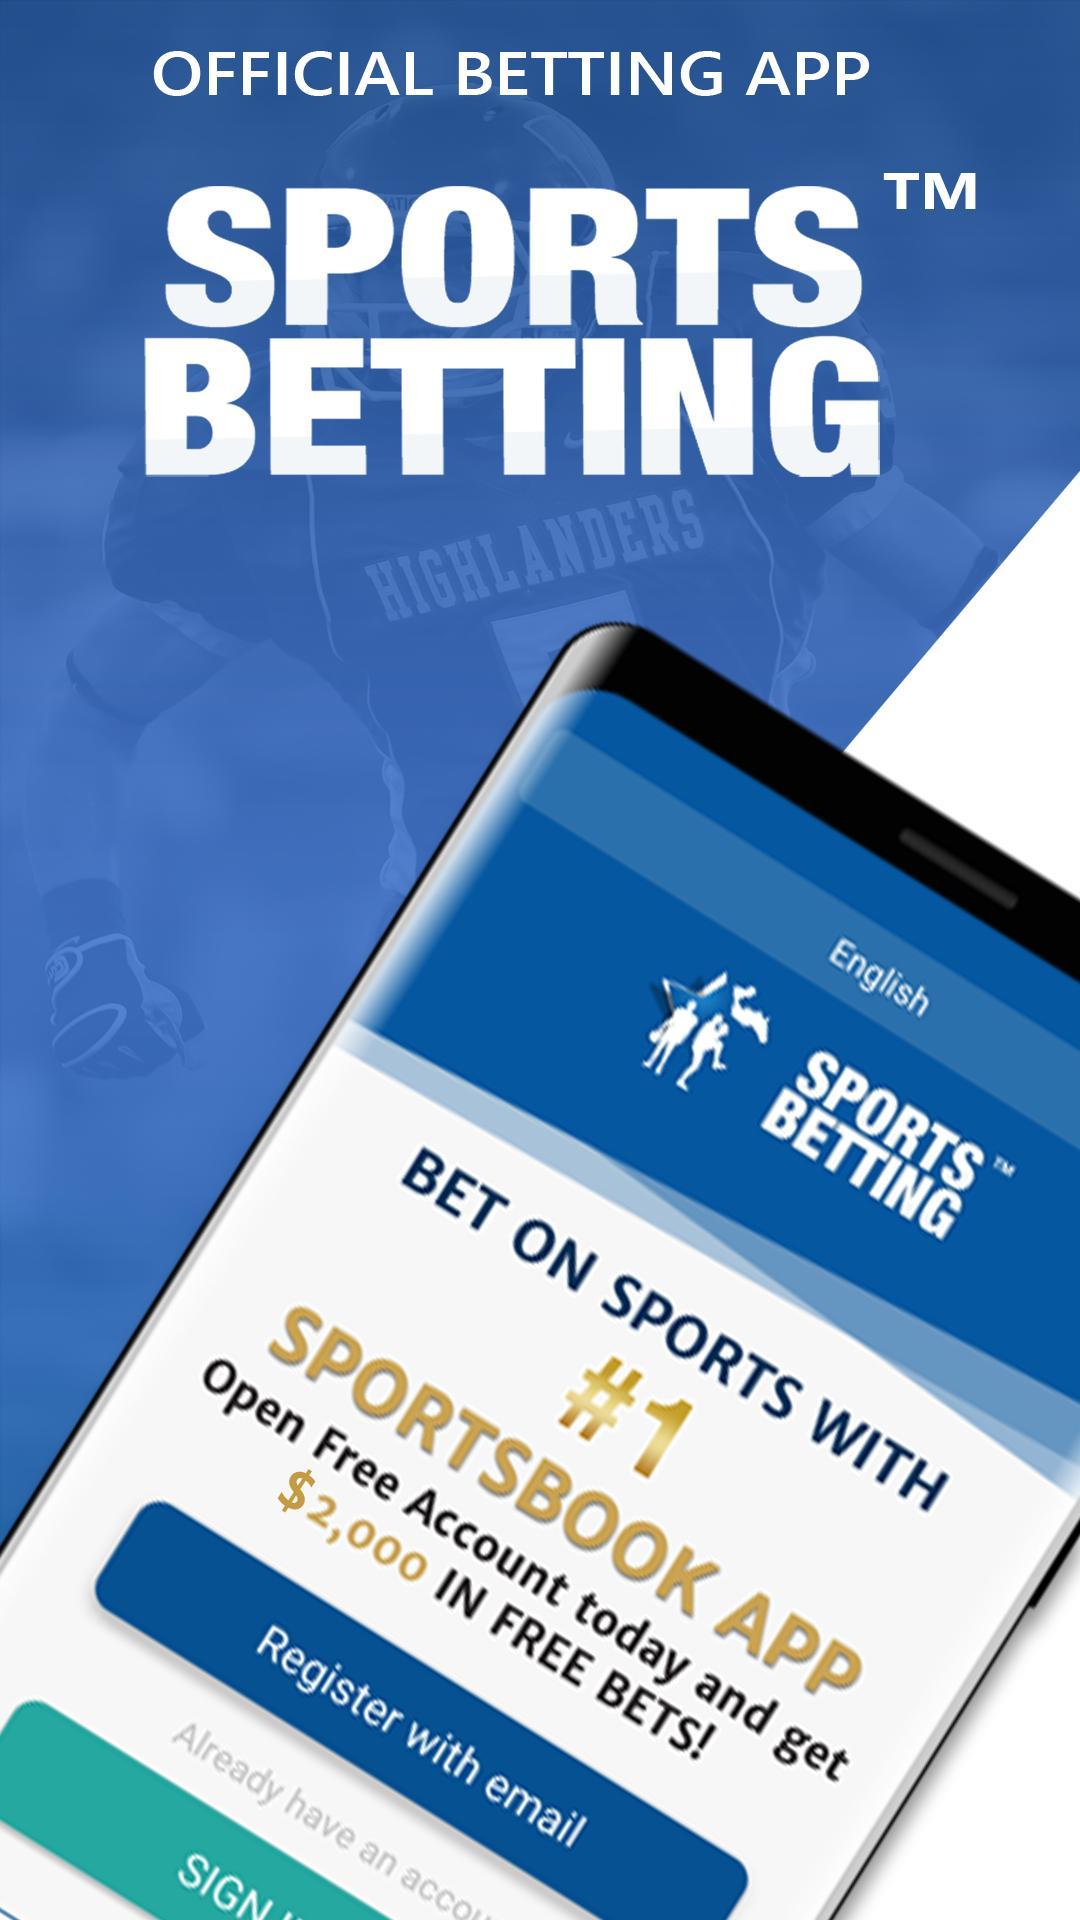 Freeplay betting trifecta betting/6 horse box cost